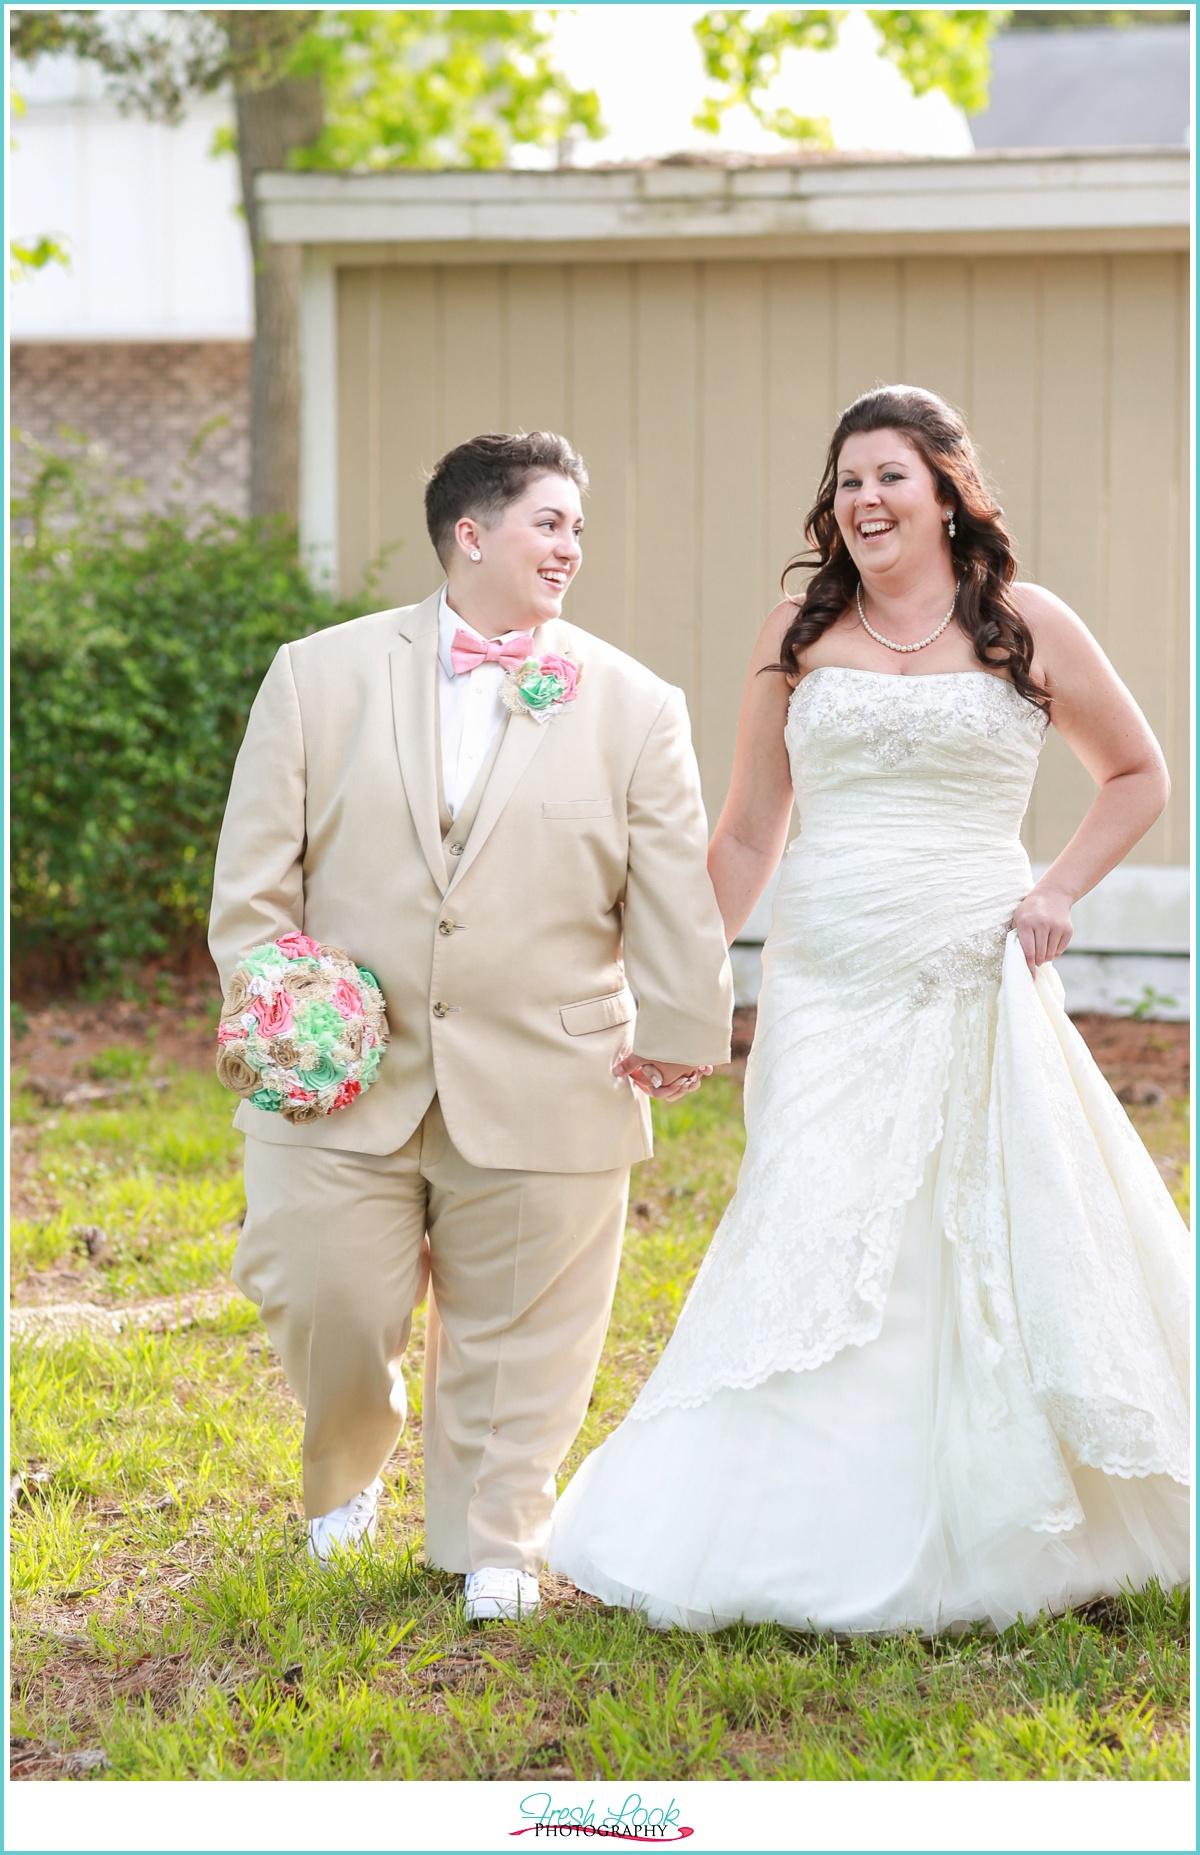 LGBT brides laughing together